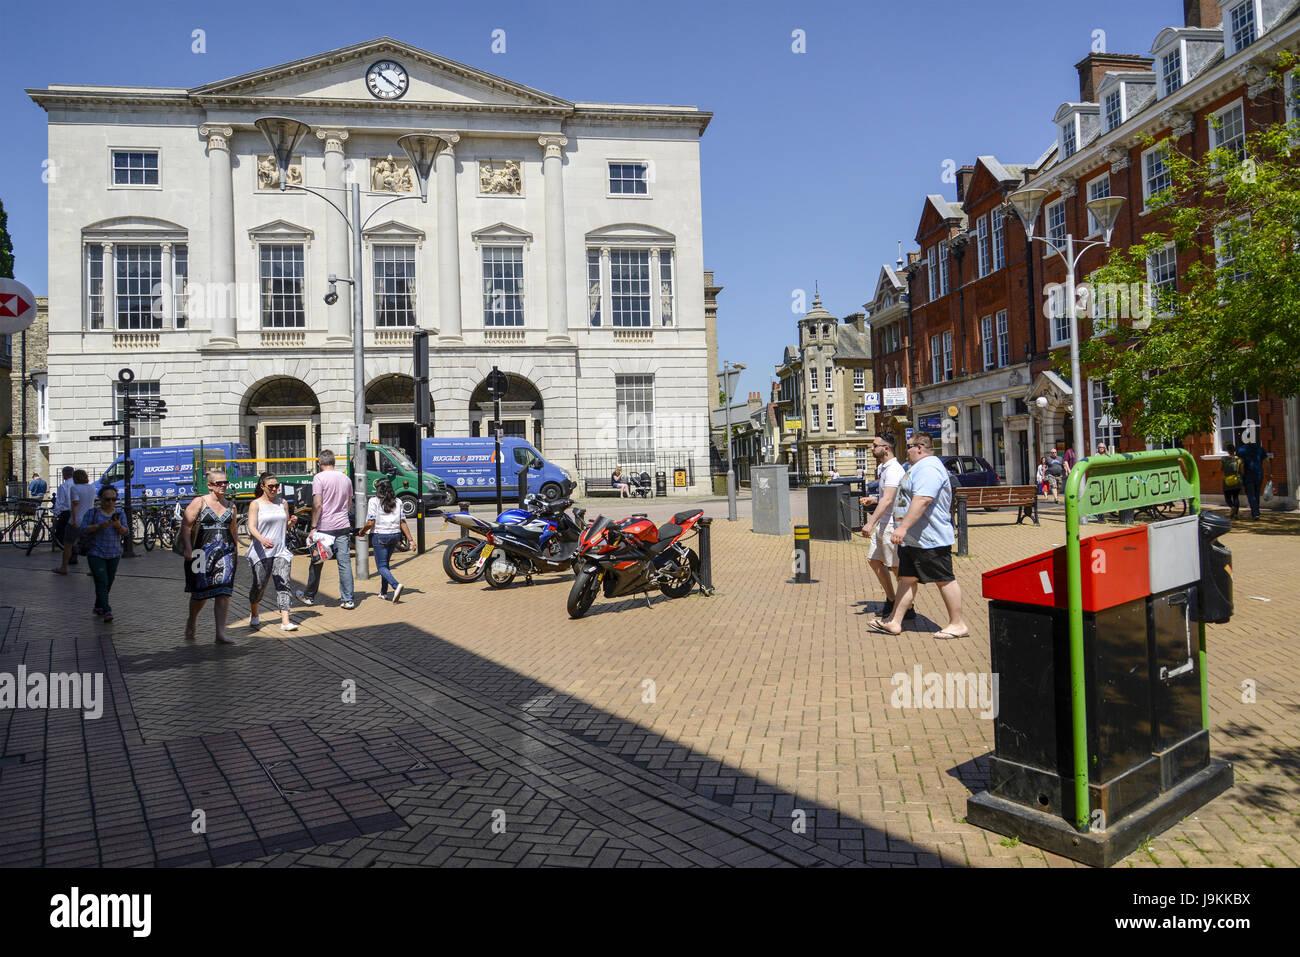 High Street - Chelmsford, Essex, England, UK - Stock Image